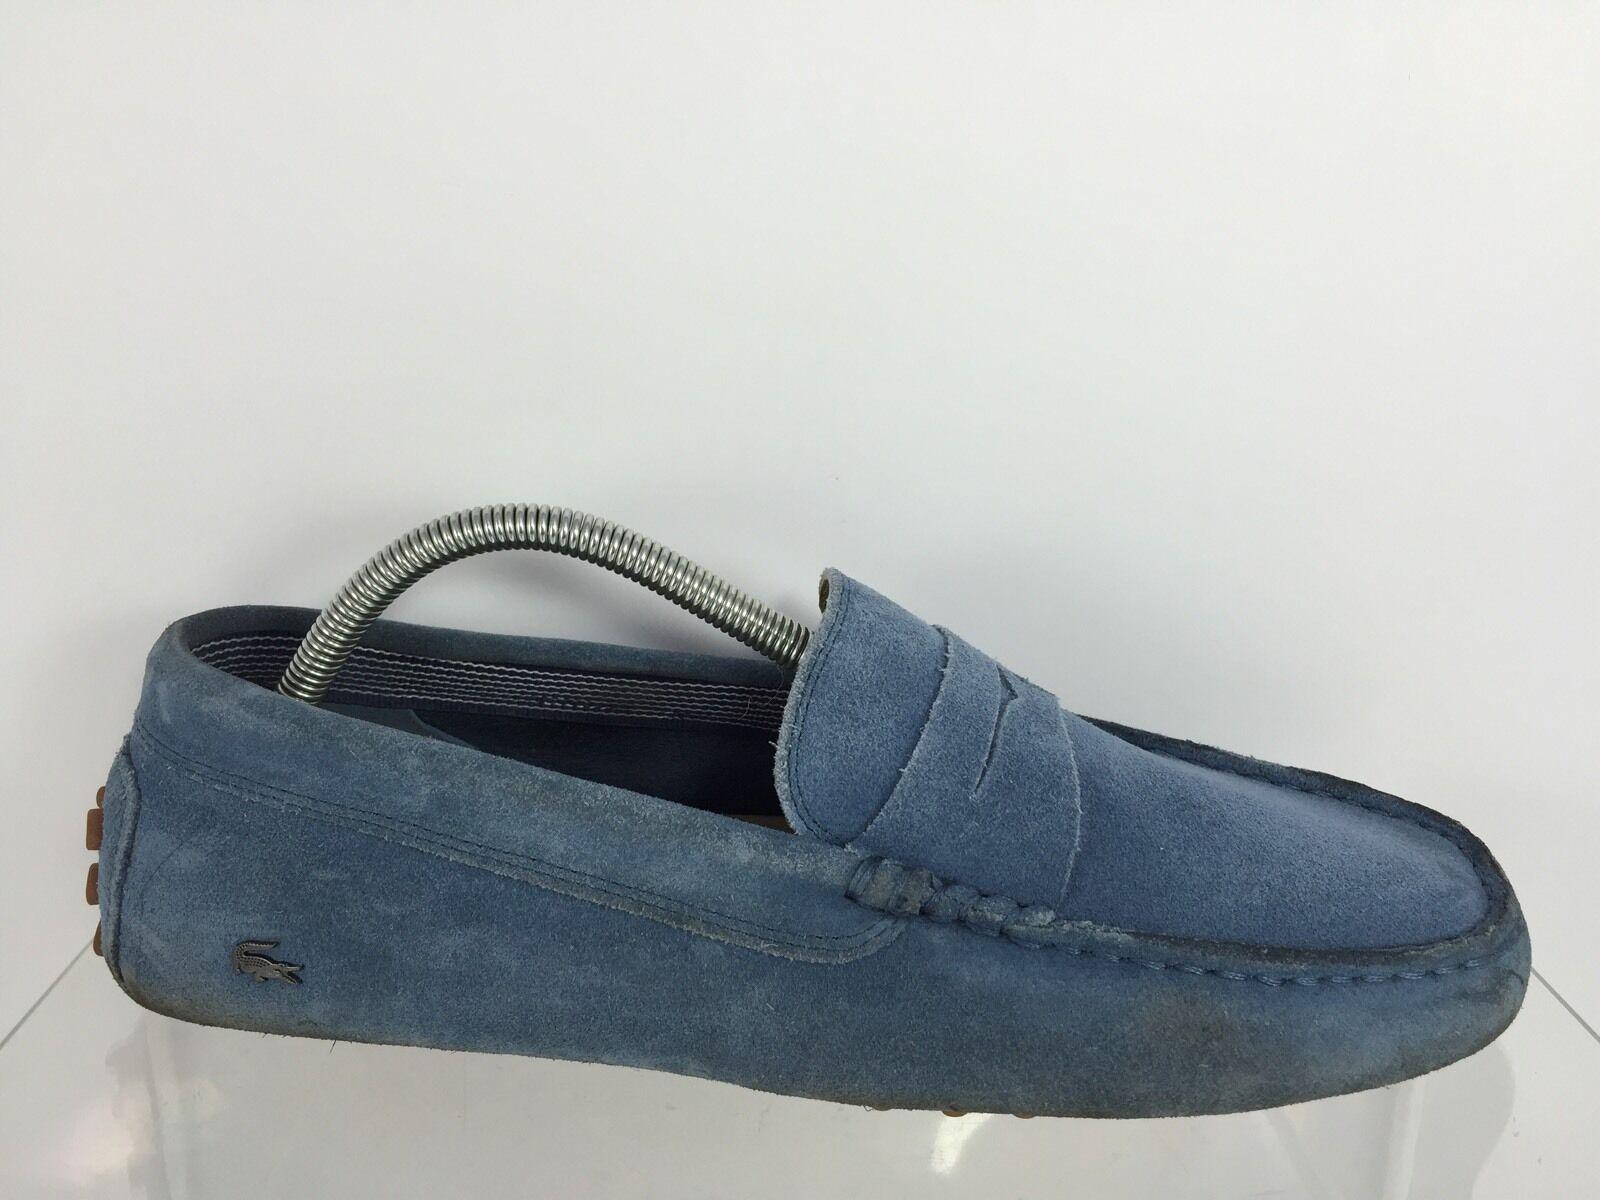 Lacoste  Uomo Blau Suede 9.5 Schuhes 9.5 Suede c28f46